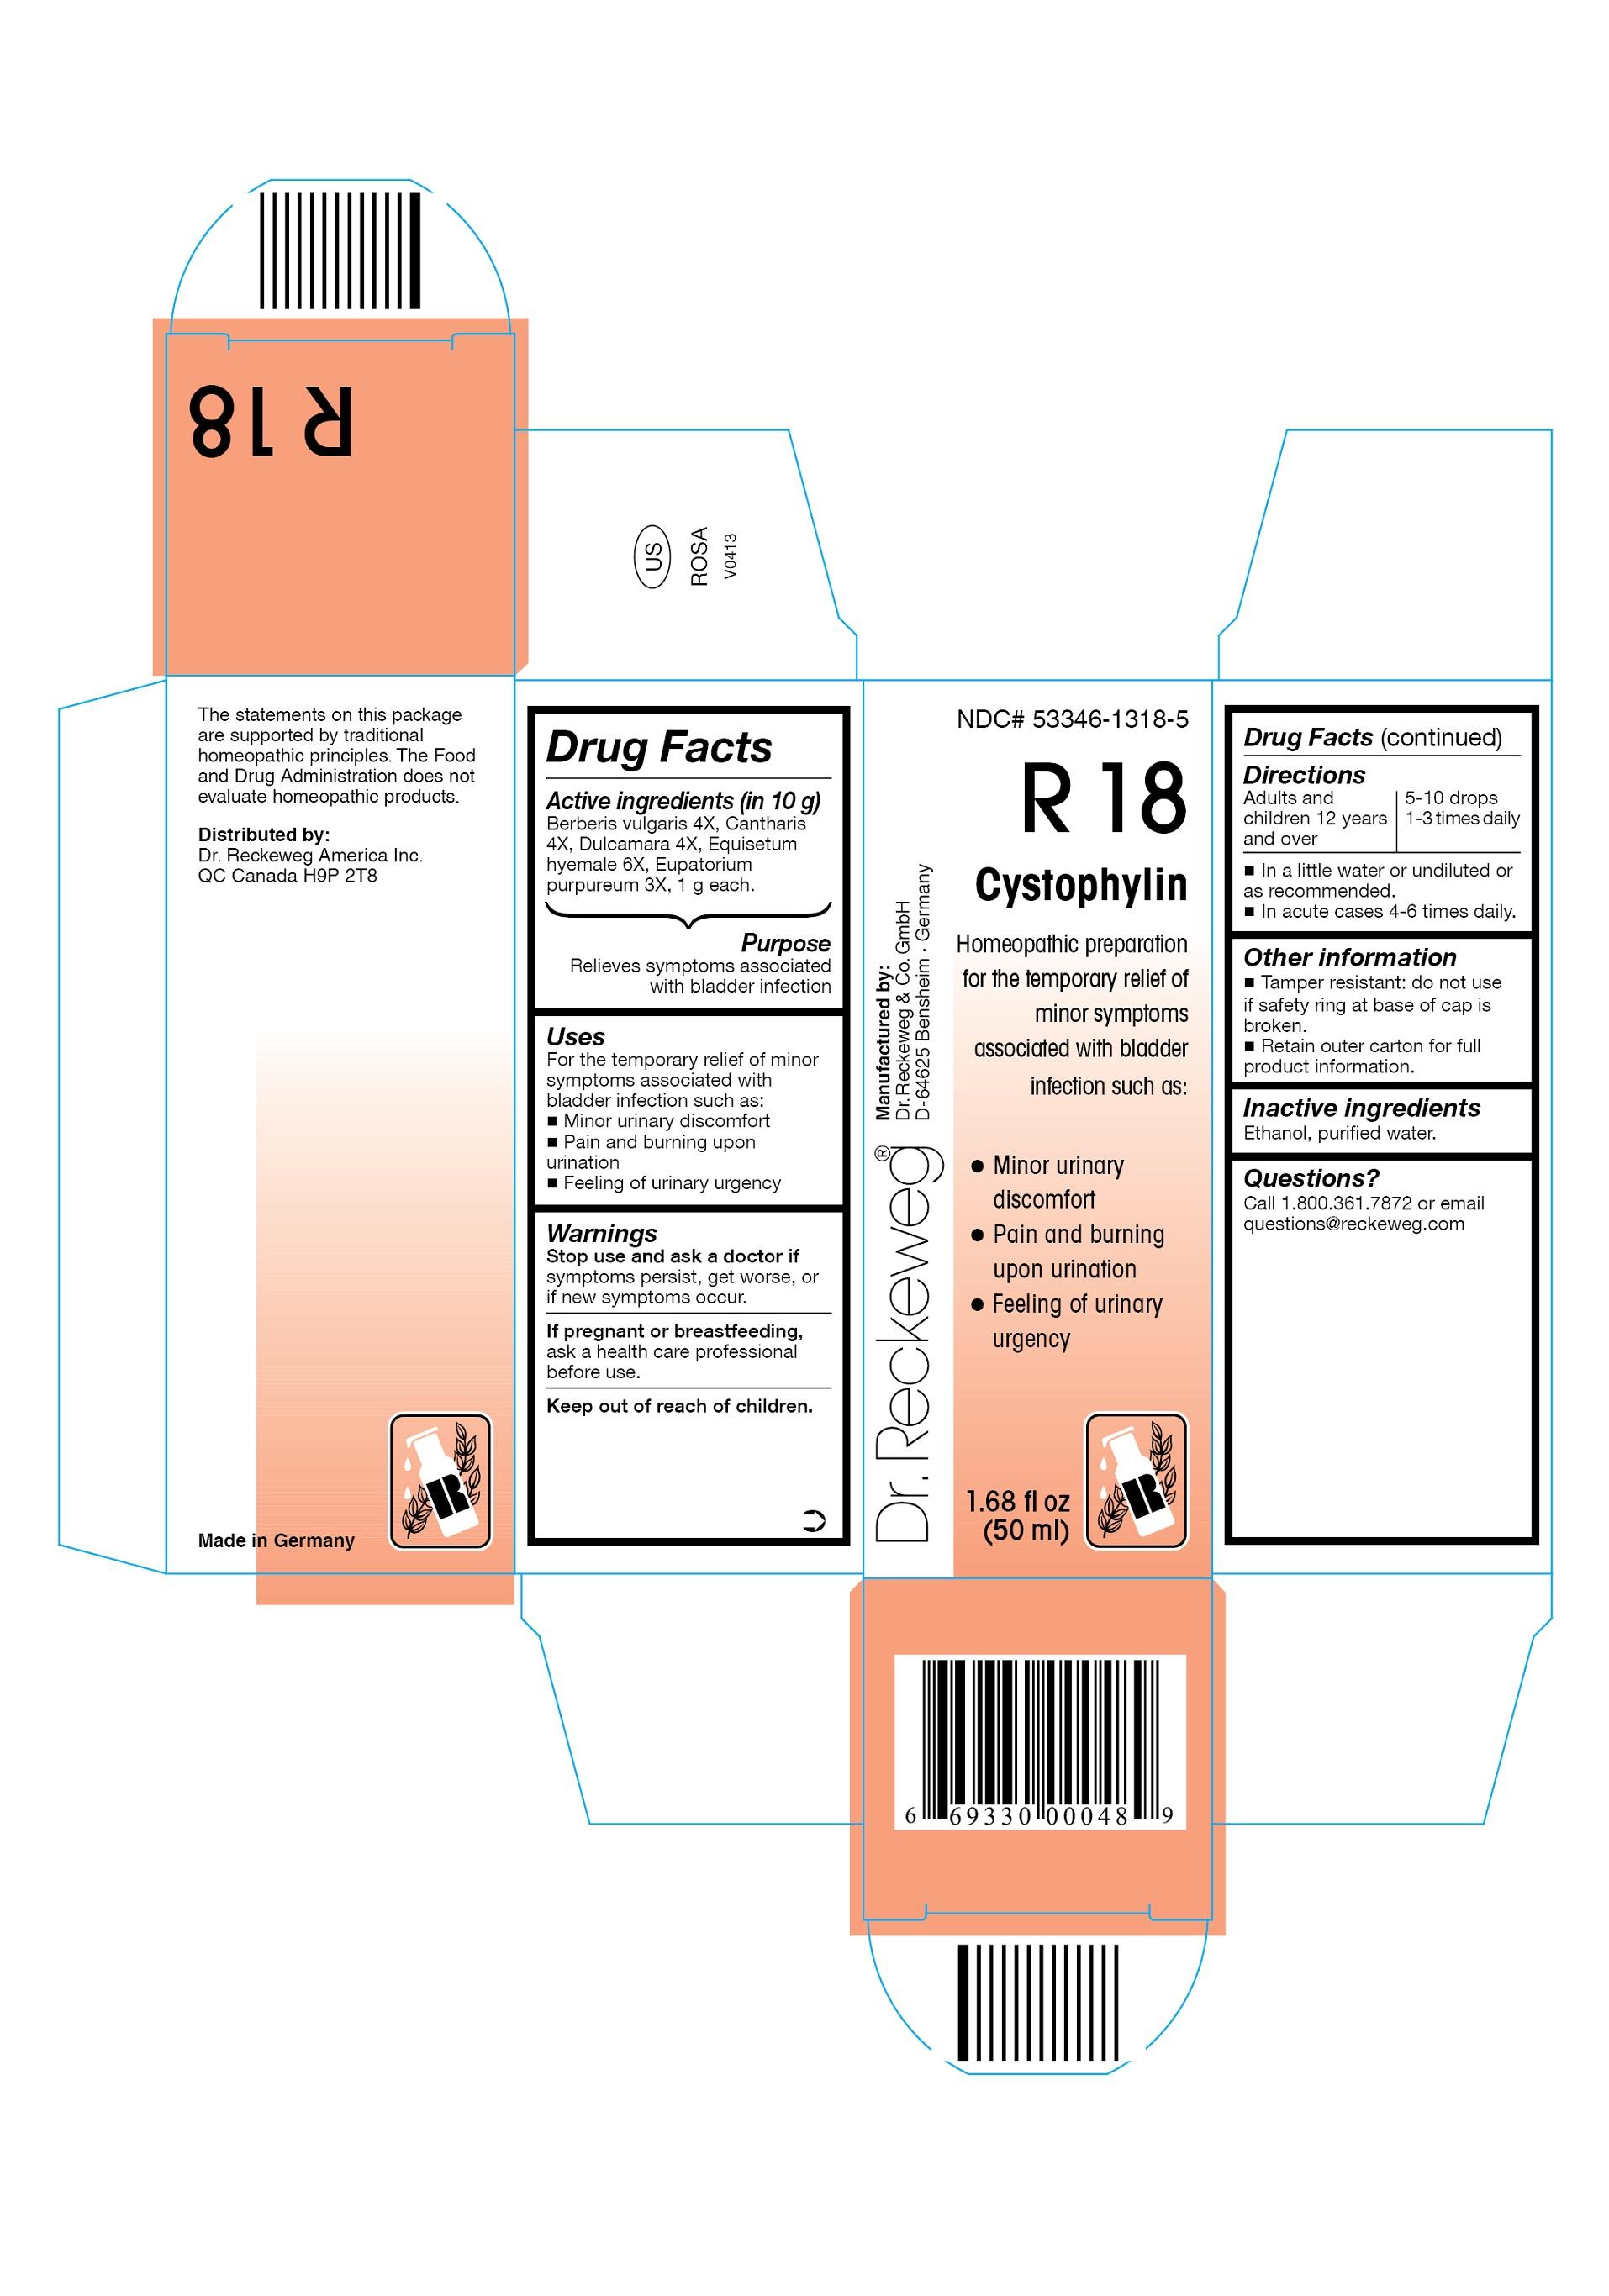 Dr. Reckeweg R18 Cystophylin Combination Product (Berberis Vulgaris 4x, Cantharis 4x, Dulcamara 4x, Equisetum Hyemale 6x, Eupatorium Purpureum 3x) Liquid [Pharmazeutische Fabrik Dr. Reckeweg & Co]